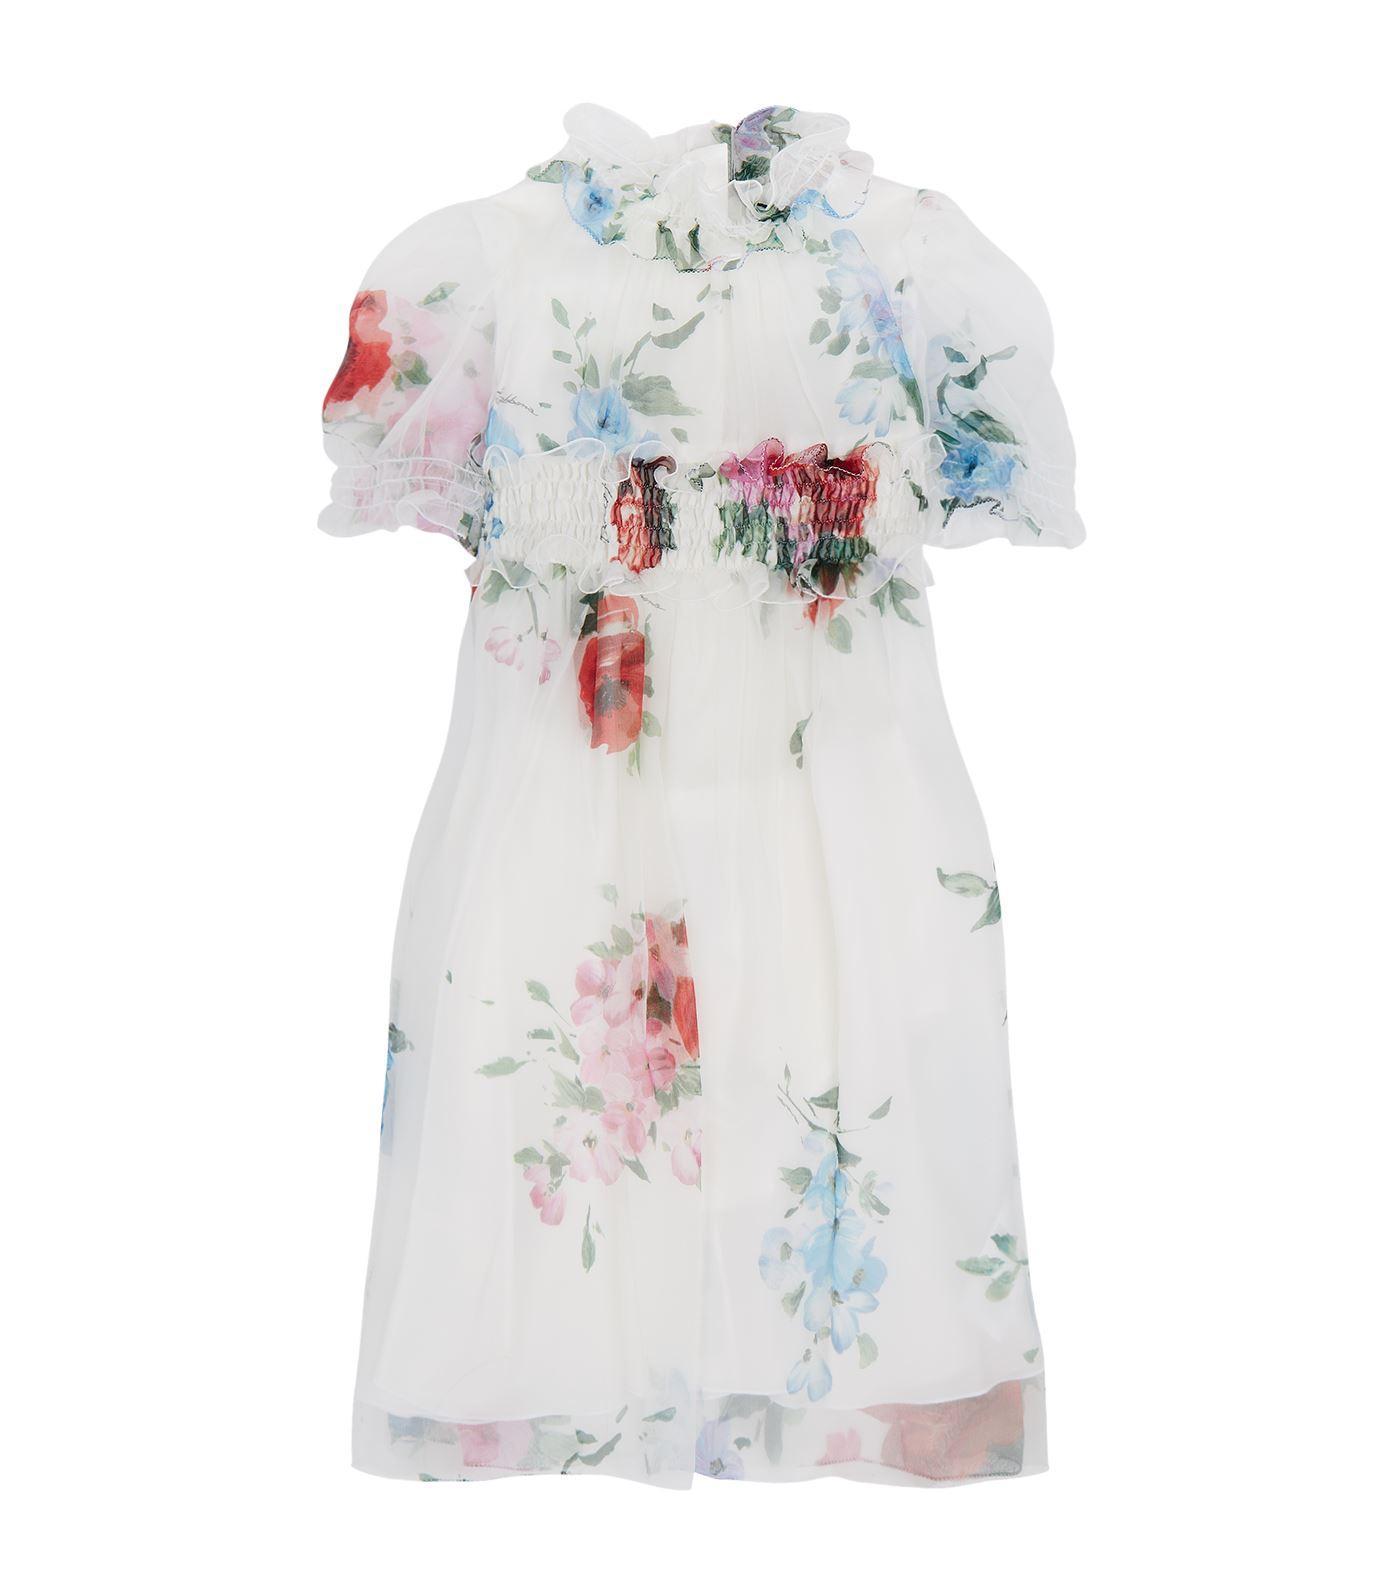 Dolce & Gabbana Floral Print Chiffon Dress In Multi